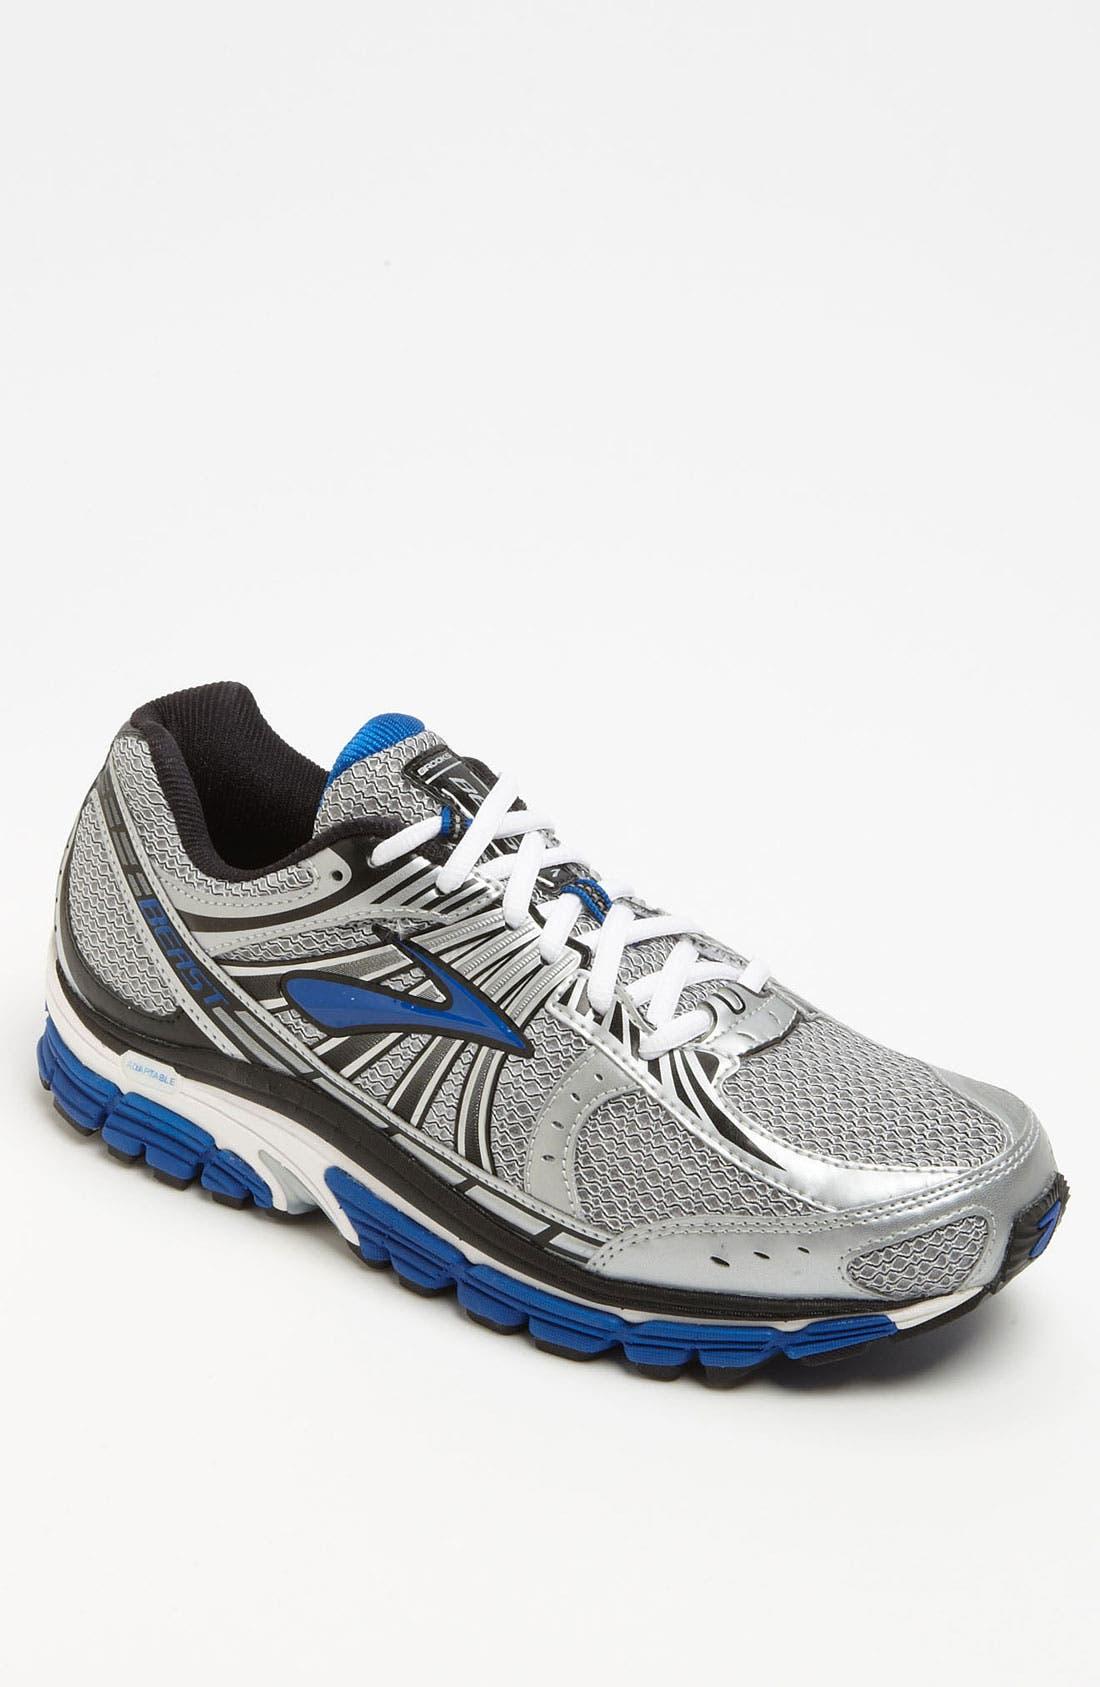 Alternate Image 1 Selected - Brooks 'Beast' Running Shoe (Men) (Regular Retail Price: $139.95)